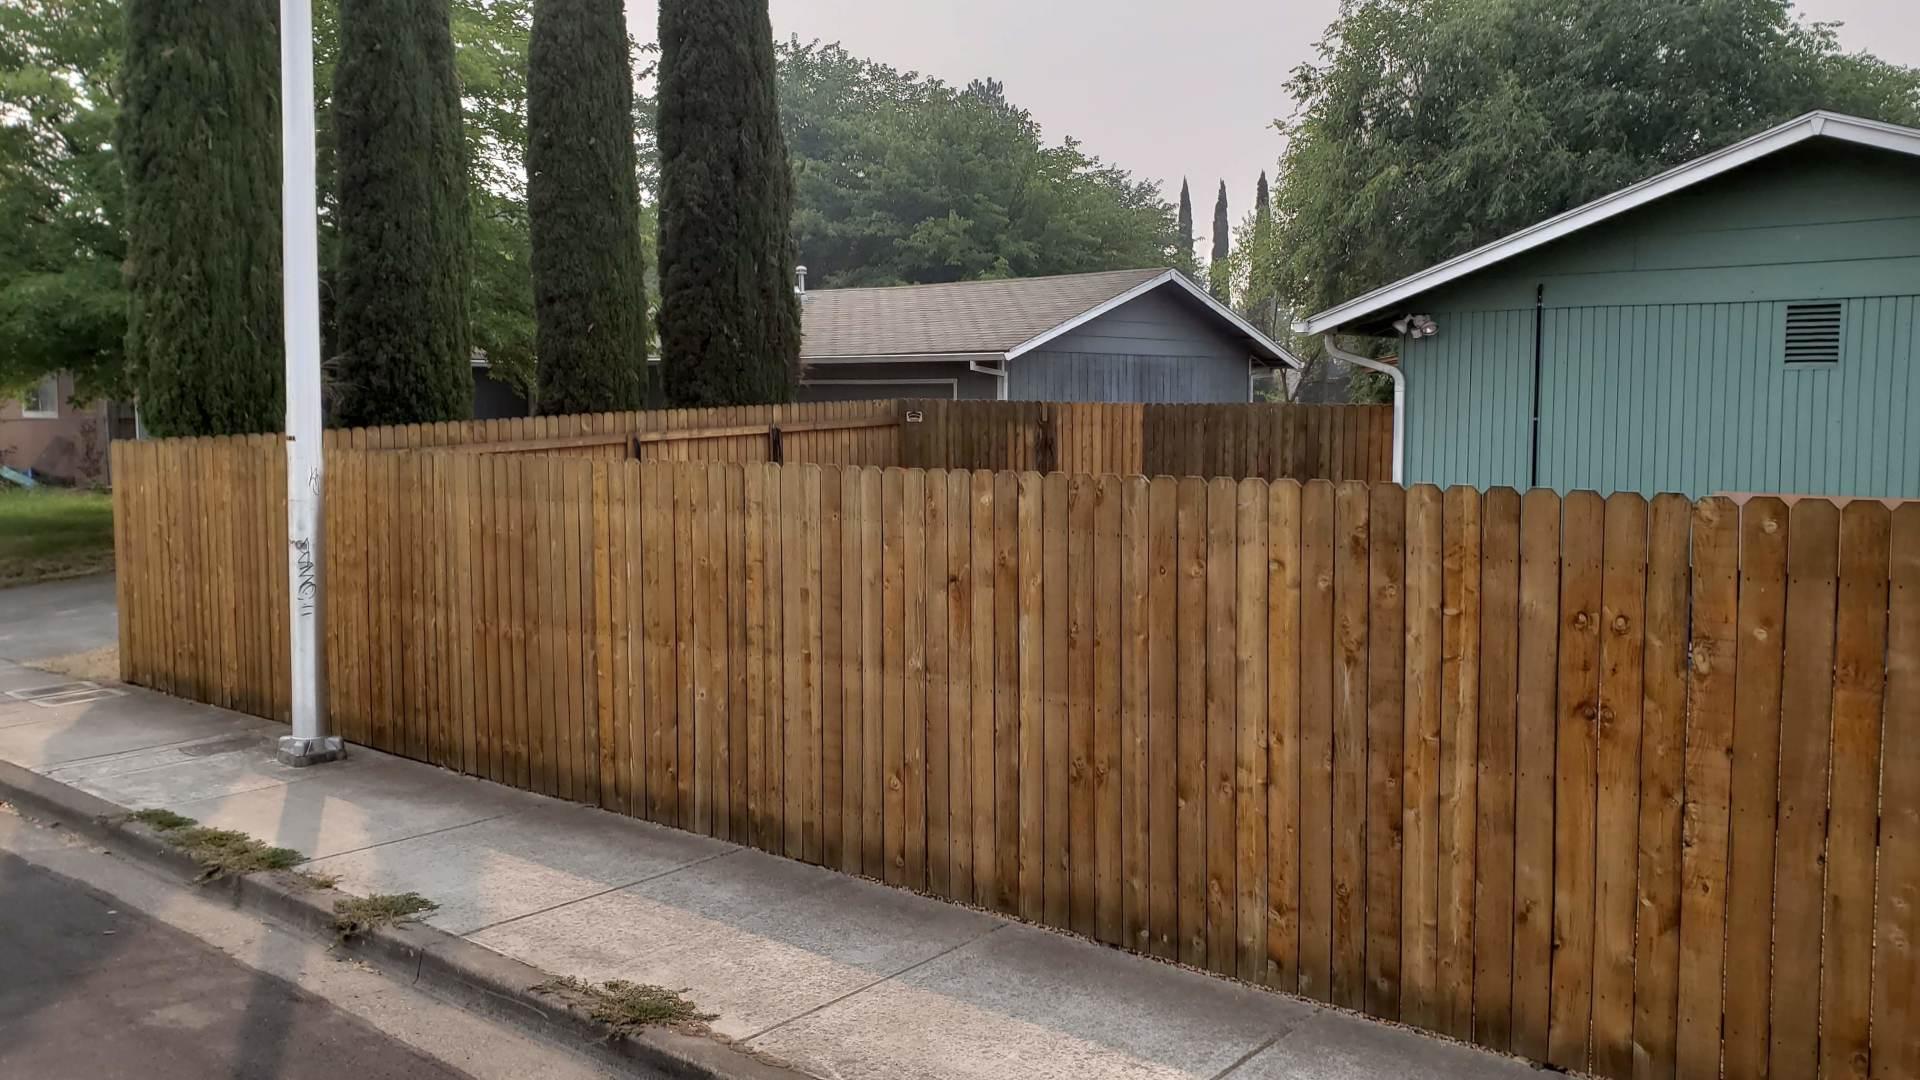 american lumber building materials southern oregon. Black Bedroom Furniture Sets. Home Design Ideas